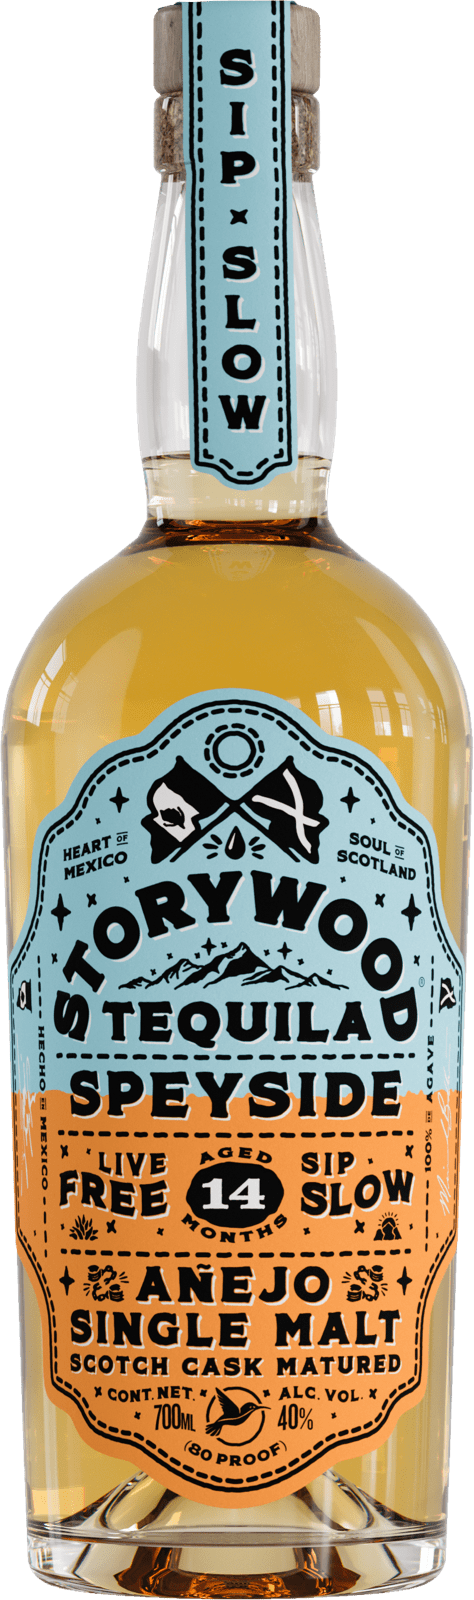 Storywood Speyside 14 anejo tequila